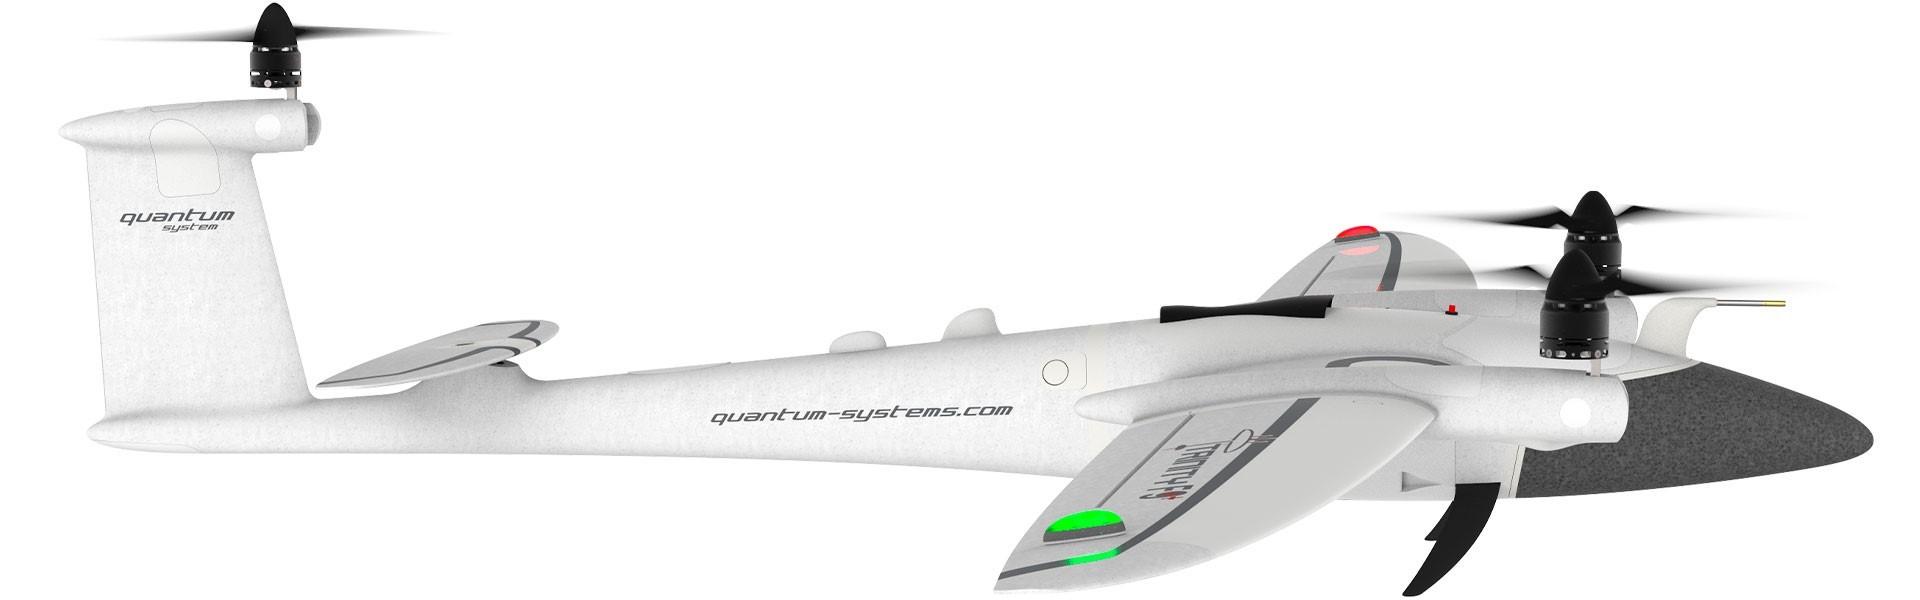 Trinity F90+ plane